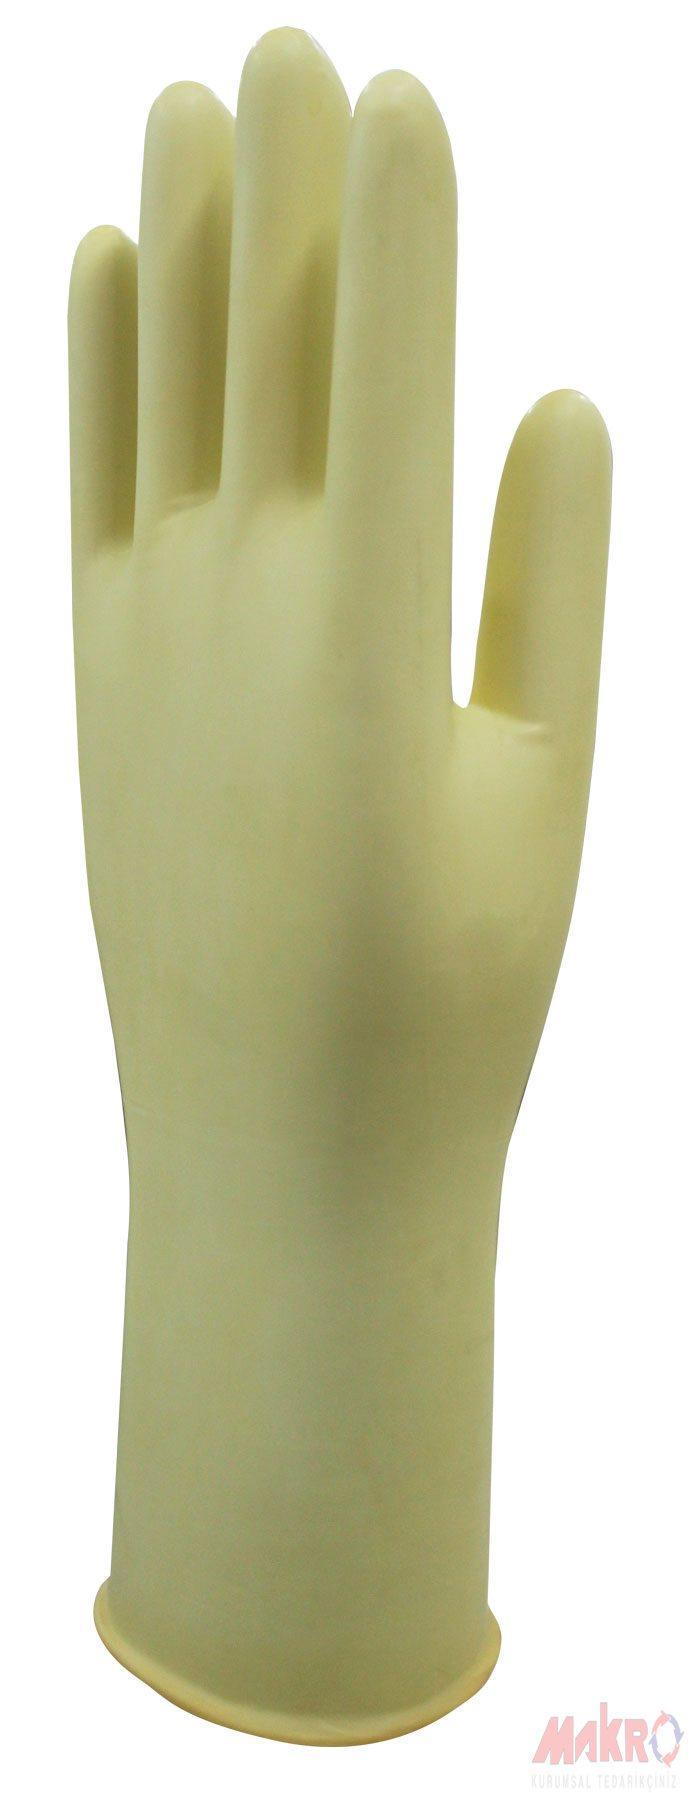 Beybi-steril-cerrahi-eldiven-platinum